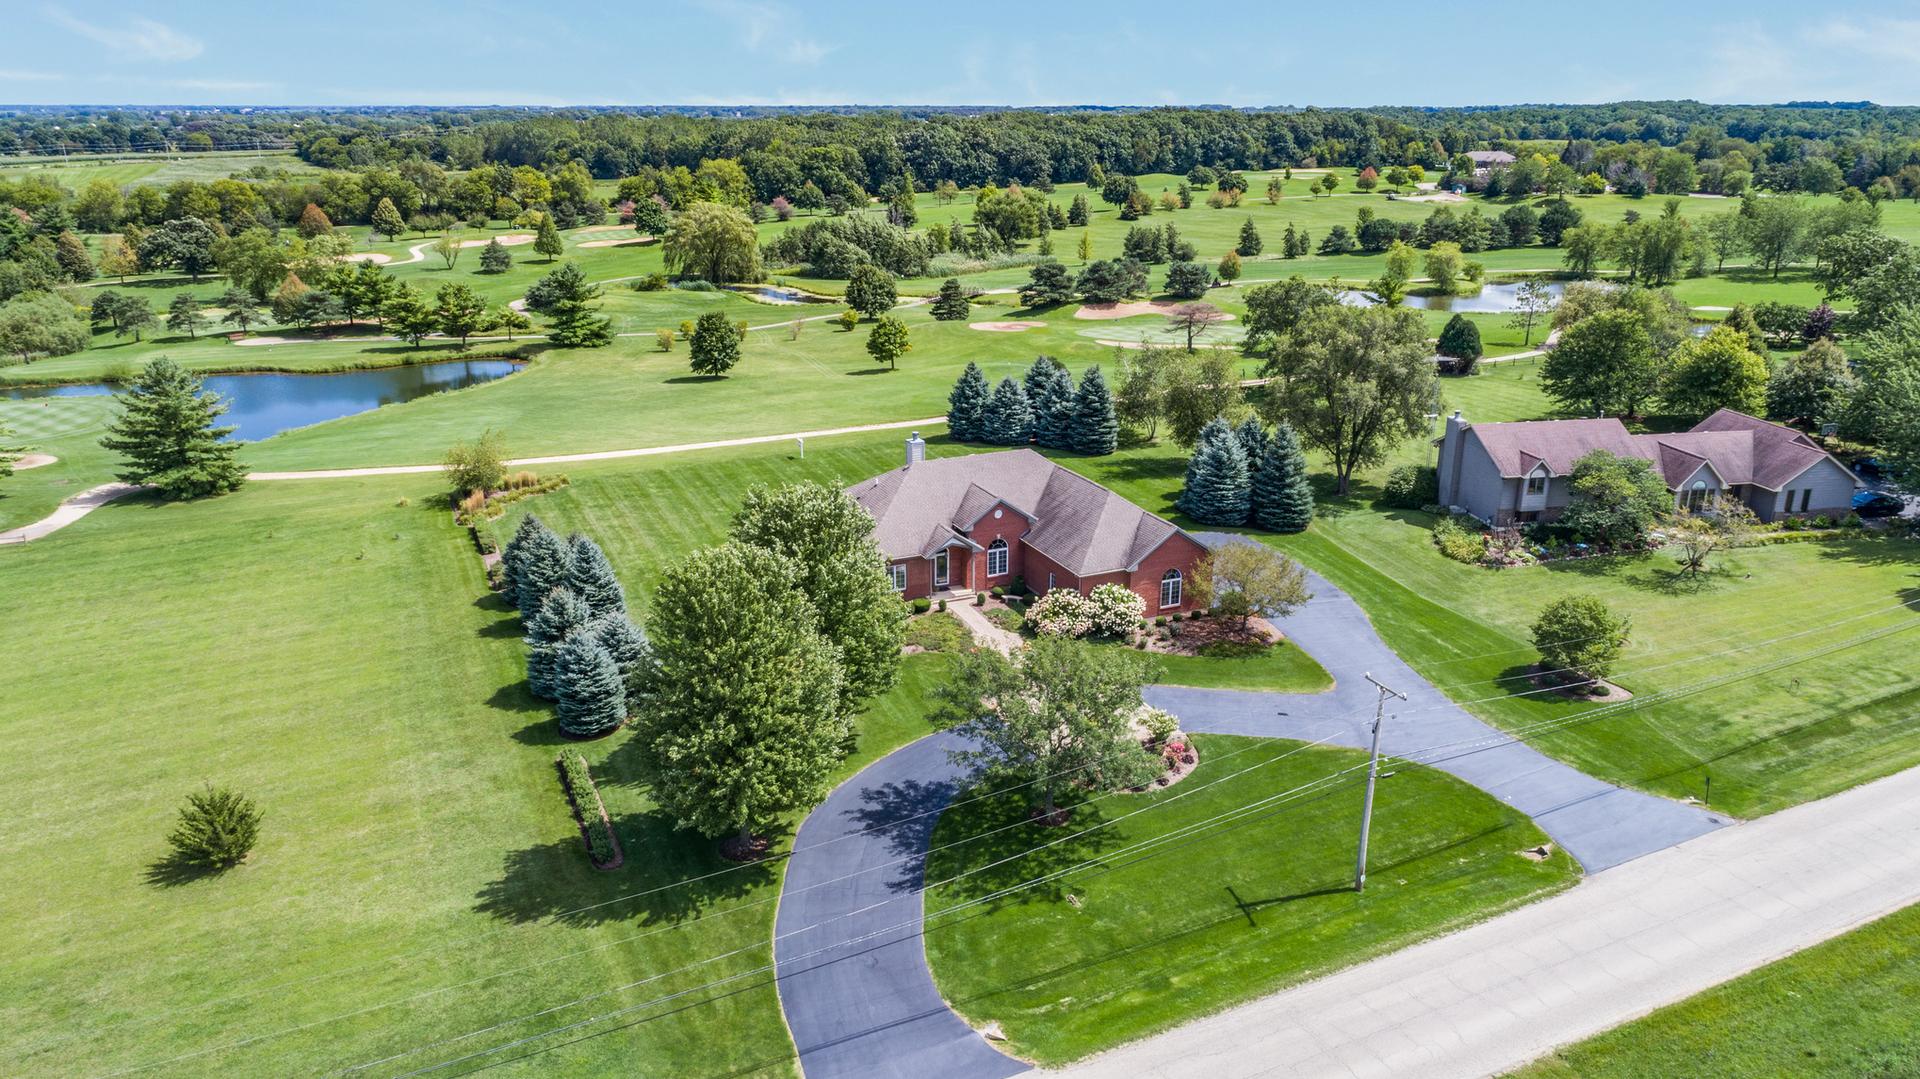 8702 Harmony Hill, Marengo, Illinois, 60152